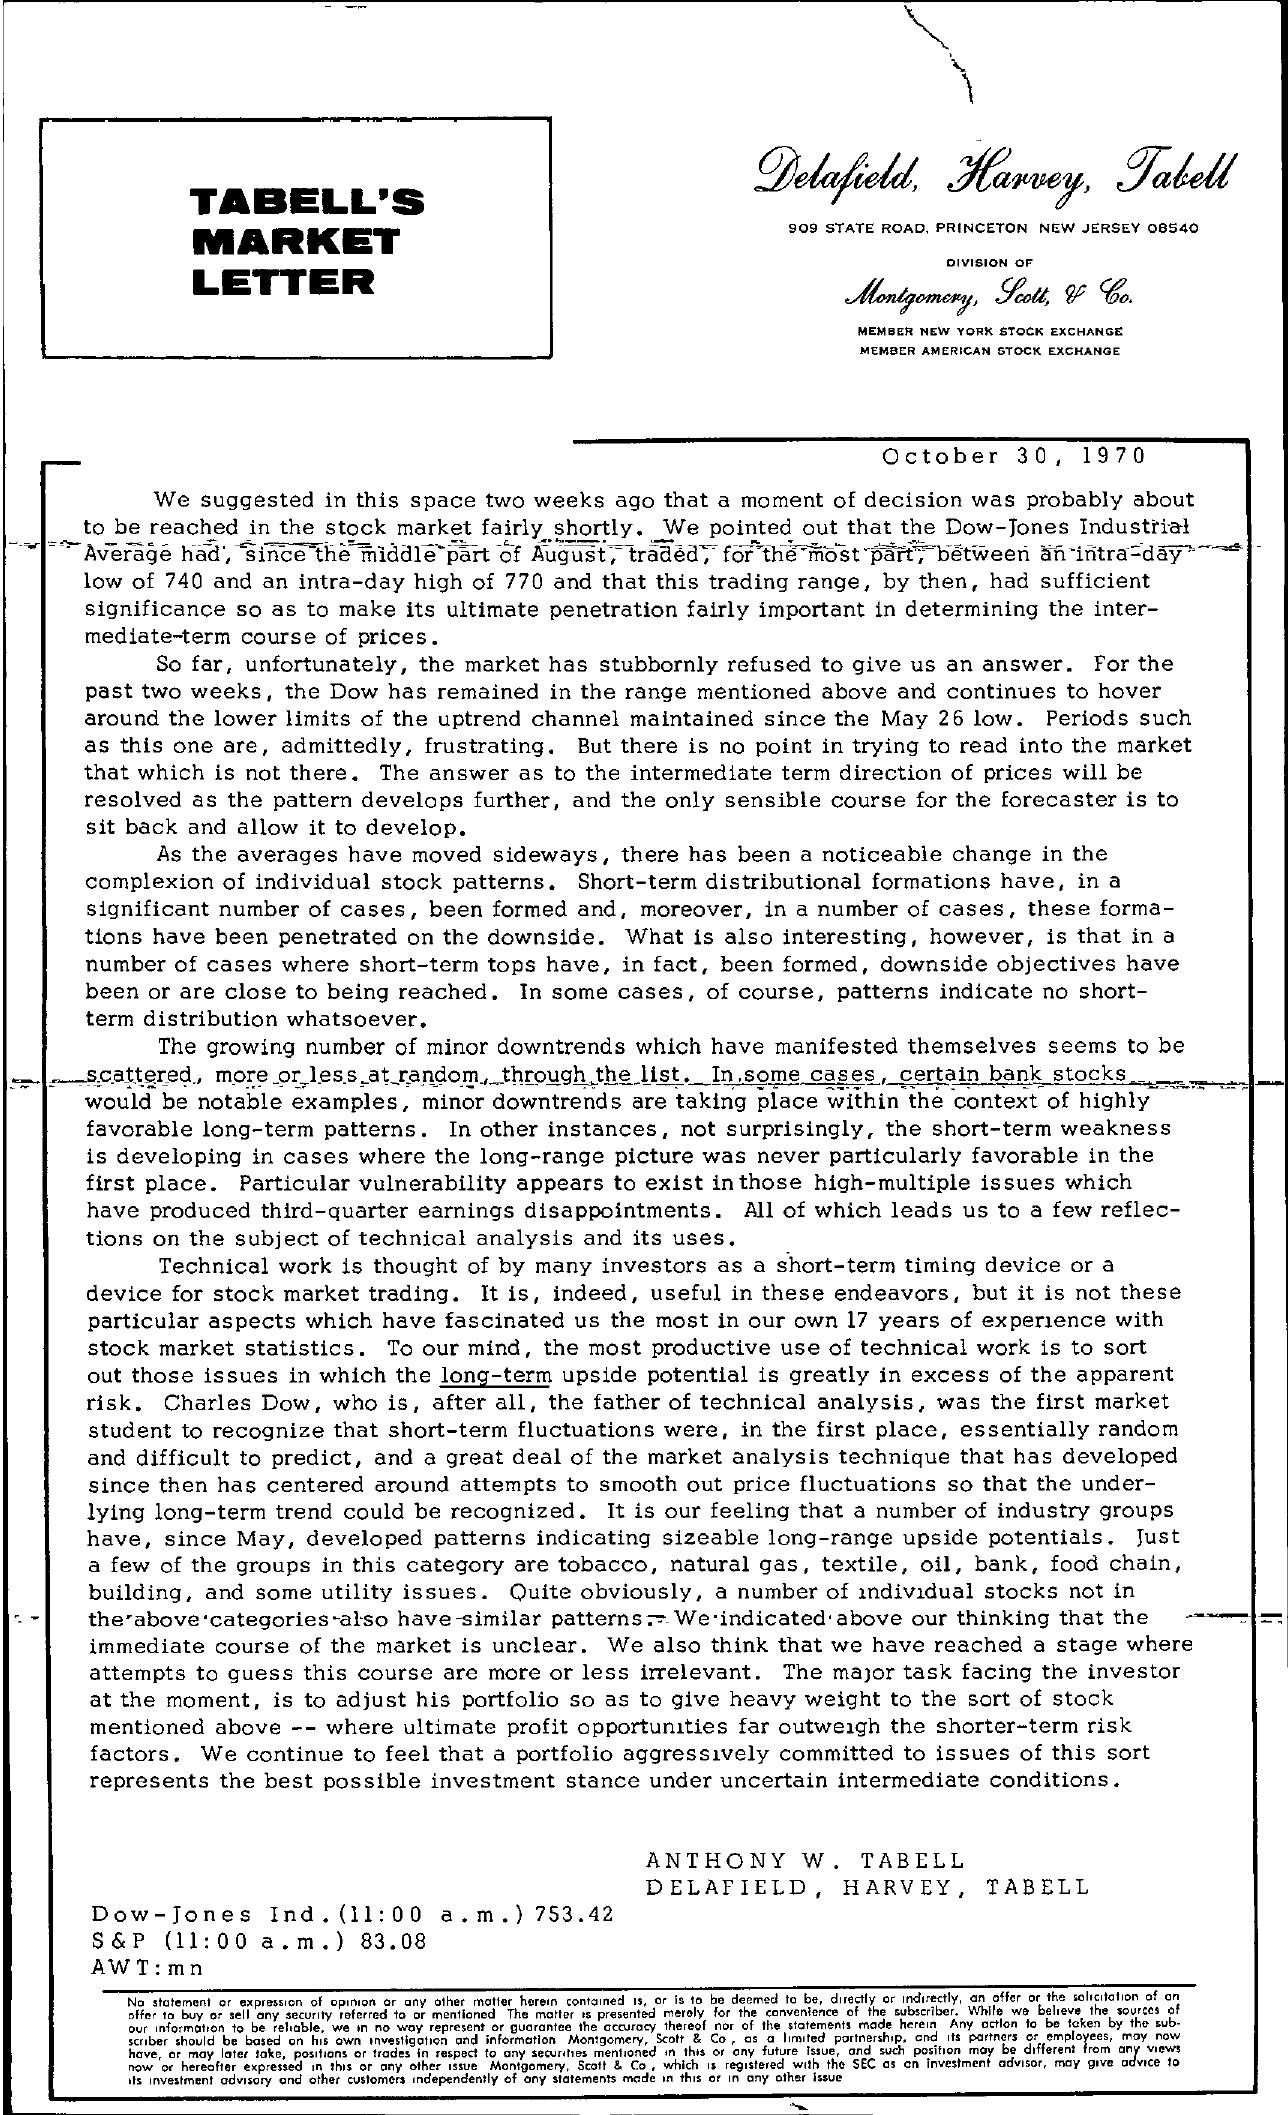 Tabell's Market Letter - October 30, 1970